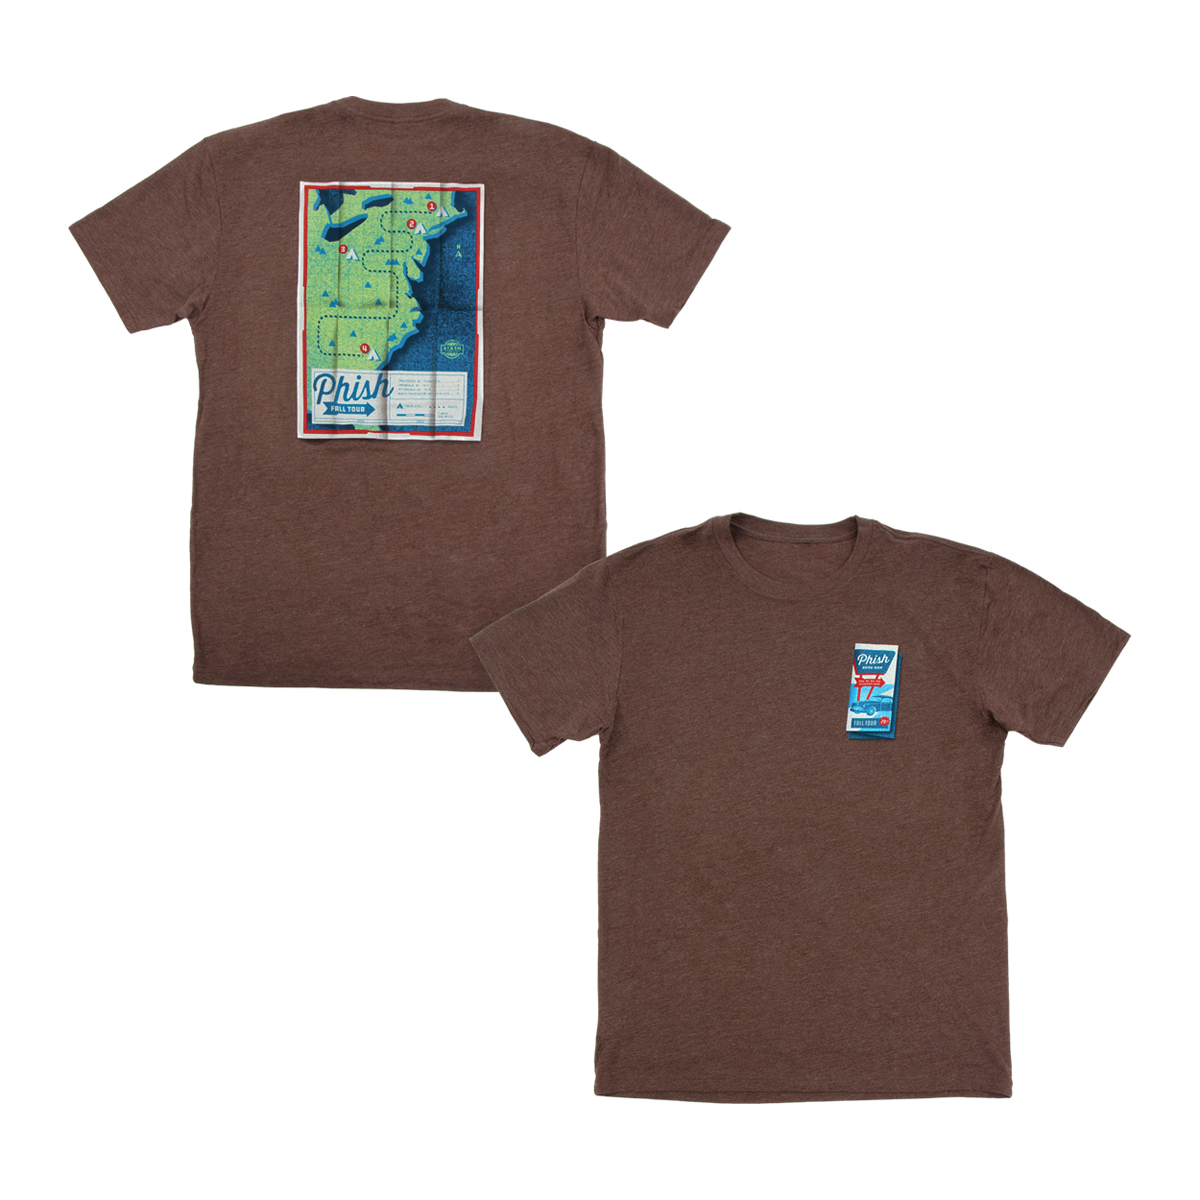 Roadmap Fall Tour T-shirt on Espresso